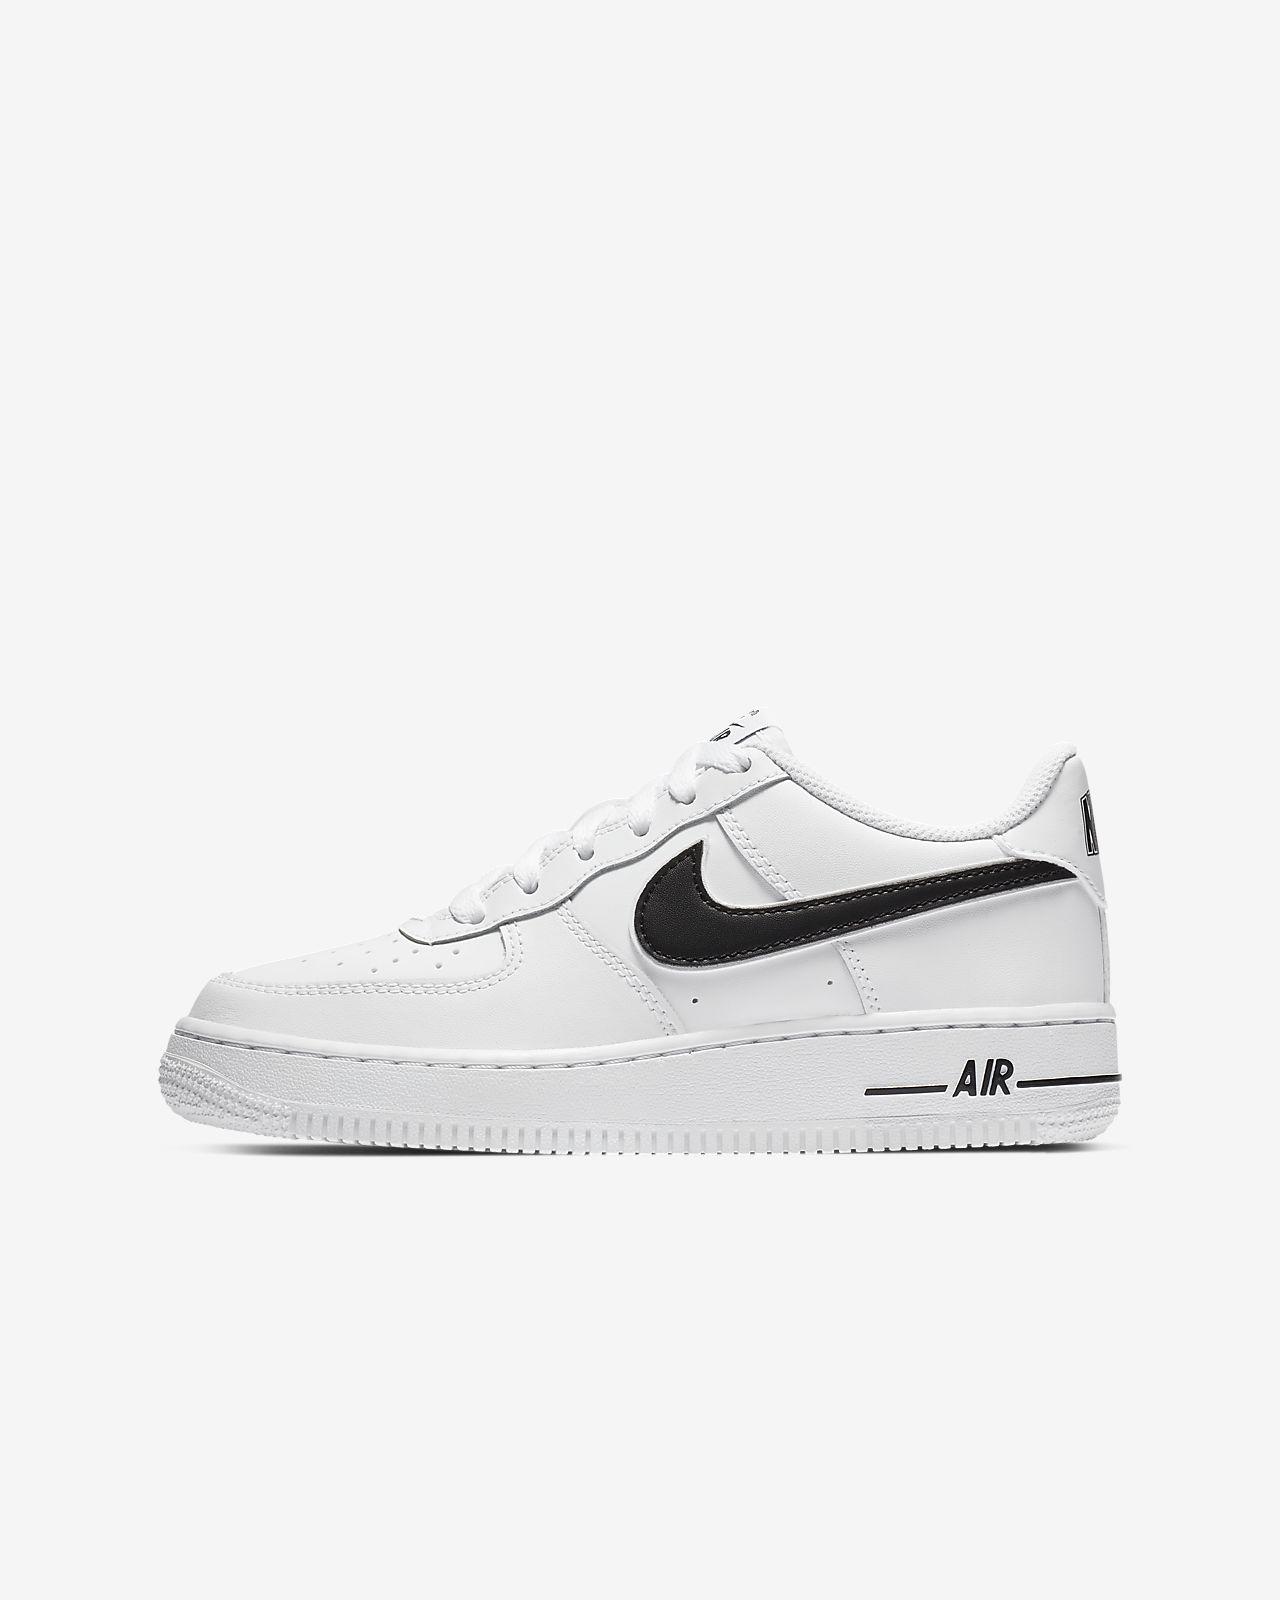 Nike Air Force 1 3 Calzado infantil blanco negro | WeAre Shop